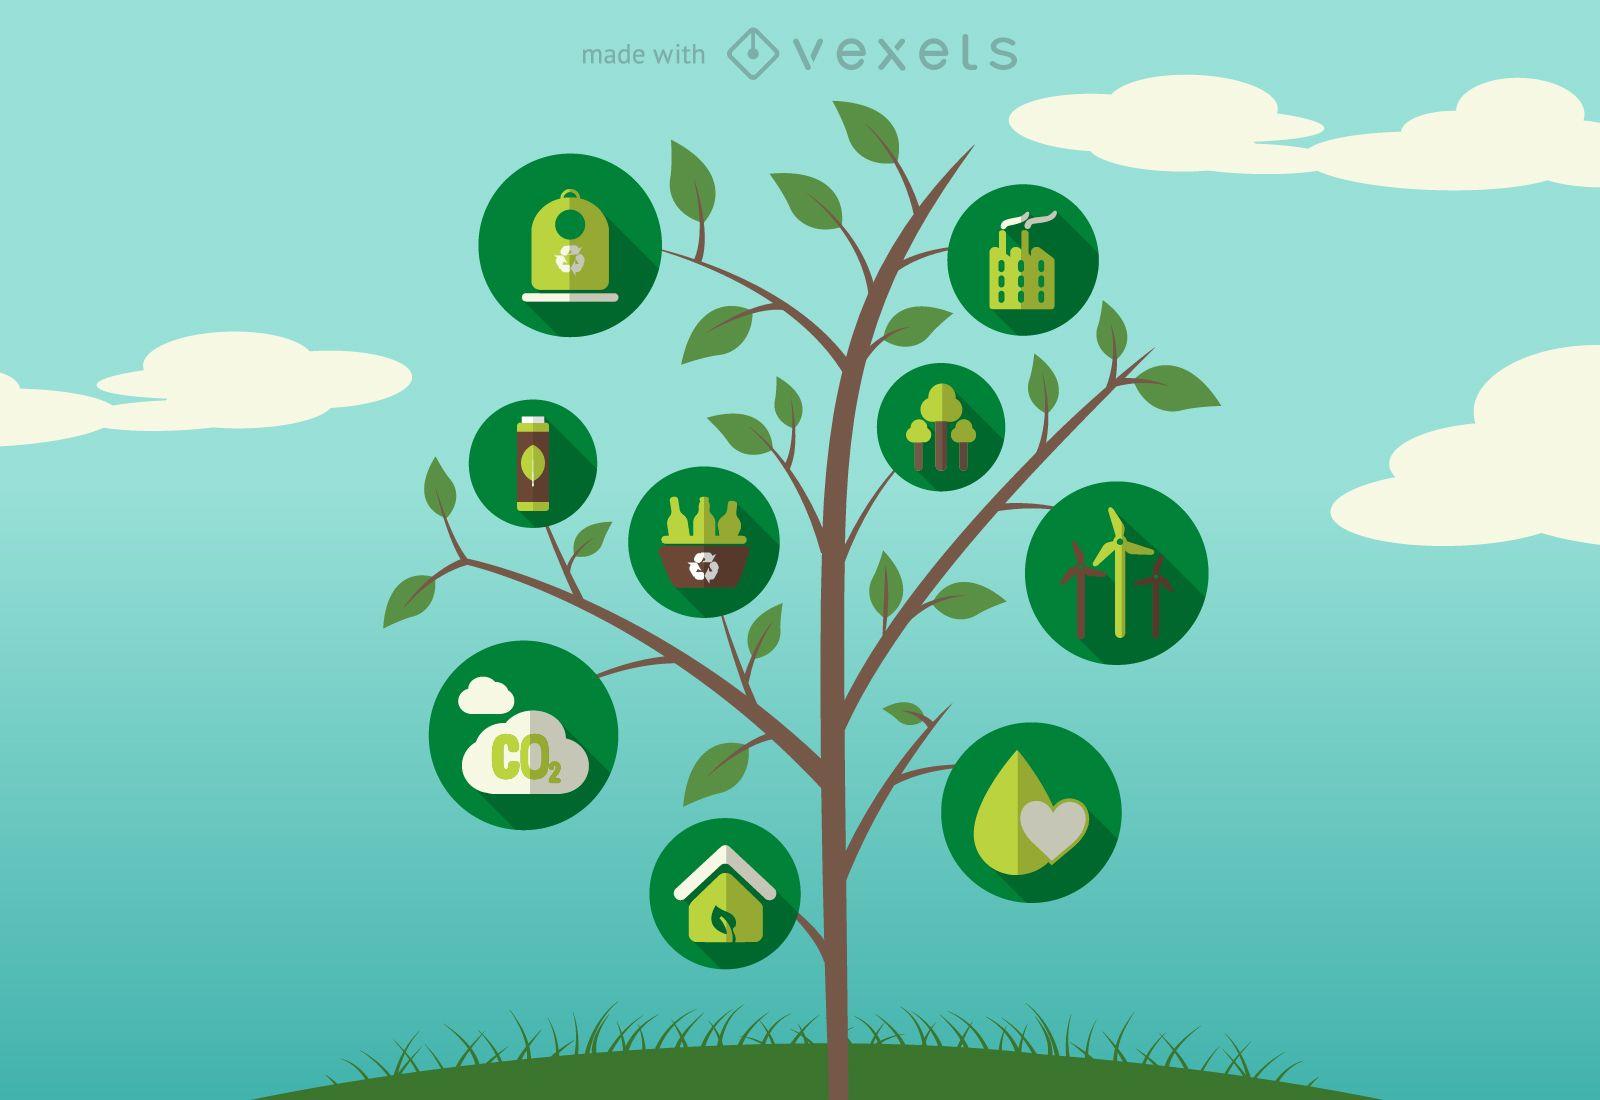 Ecology poster maker